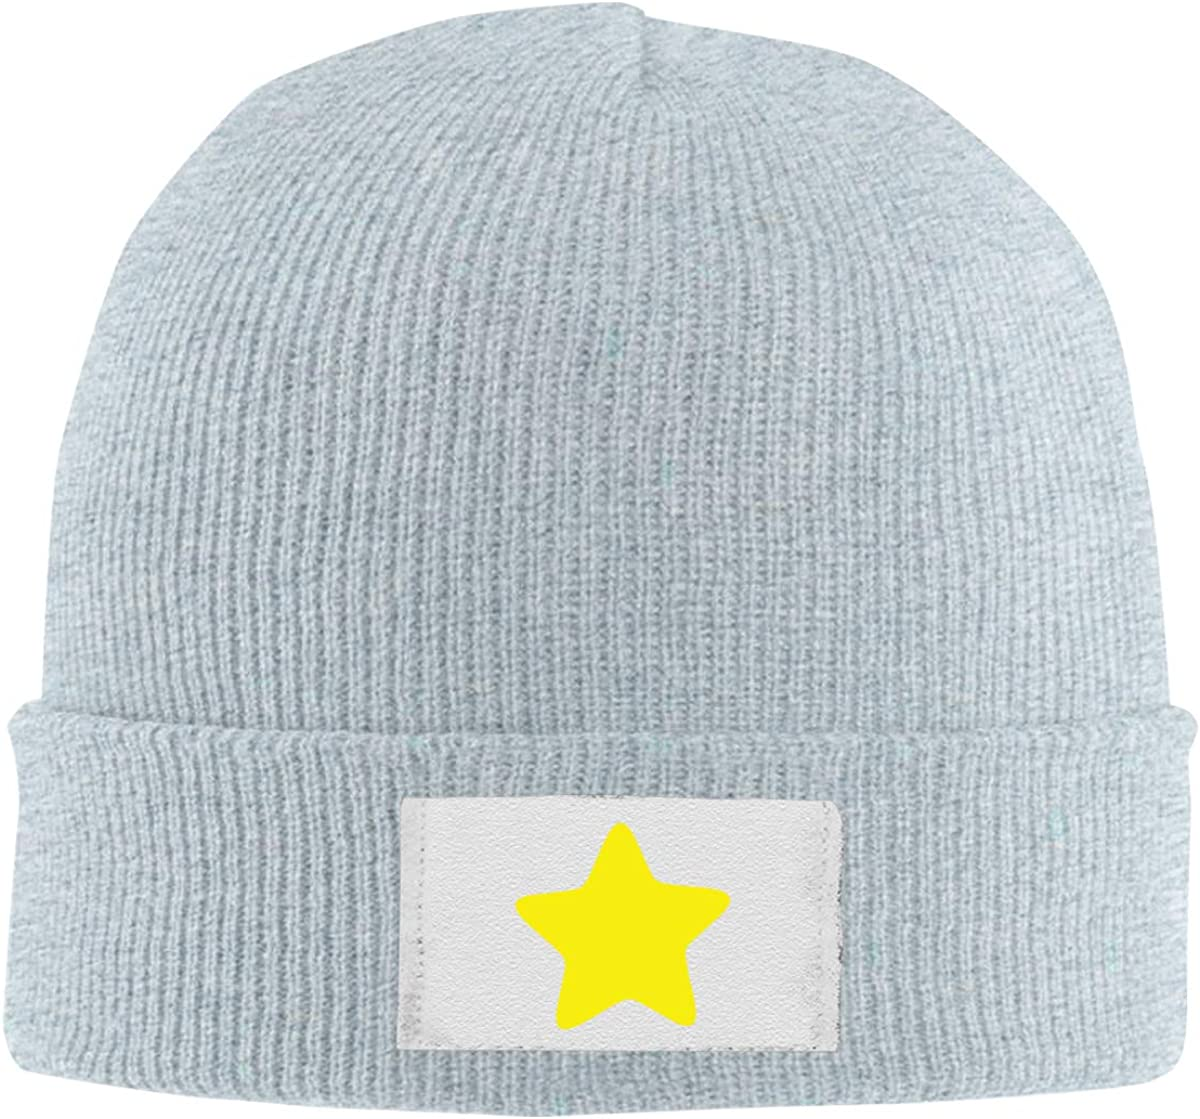 Stretchy Cuff Beanie Hat Black Dunpaiaa Skull Caps Yellow Star Logo Winter Warm Knit Hats